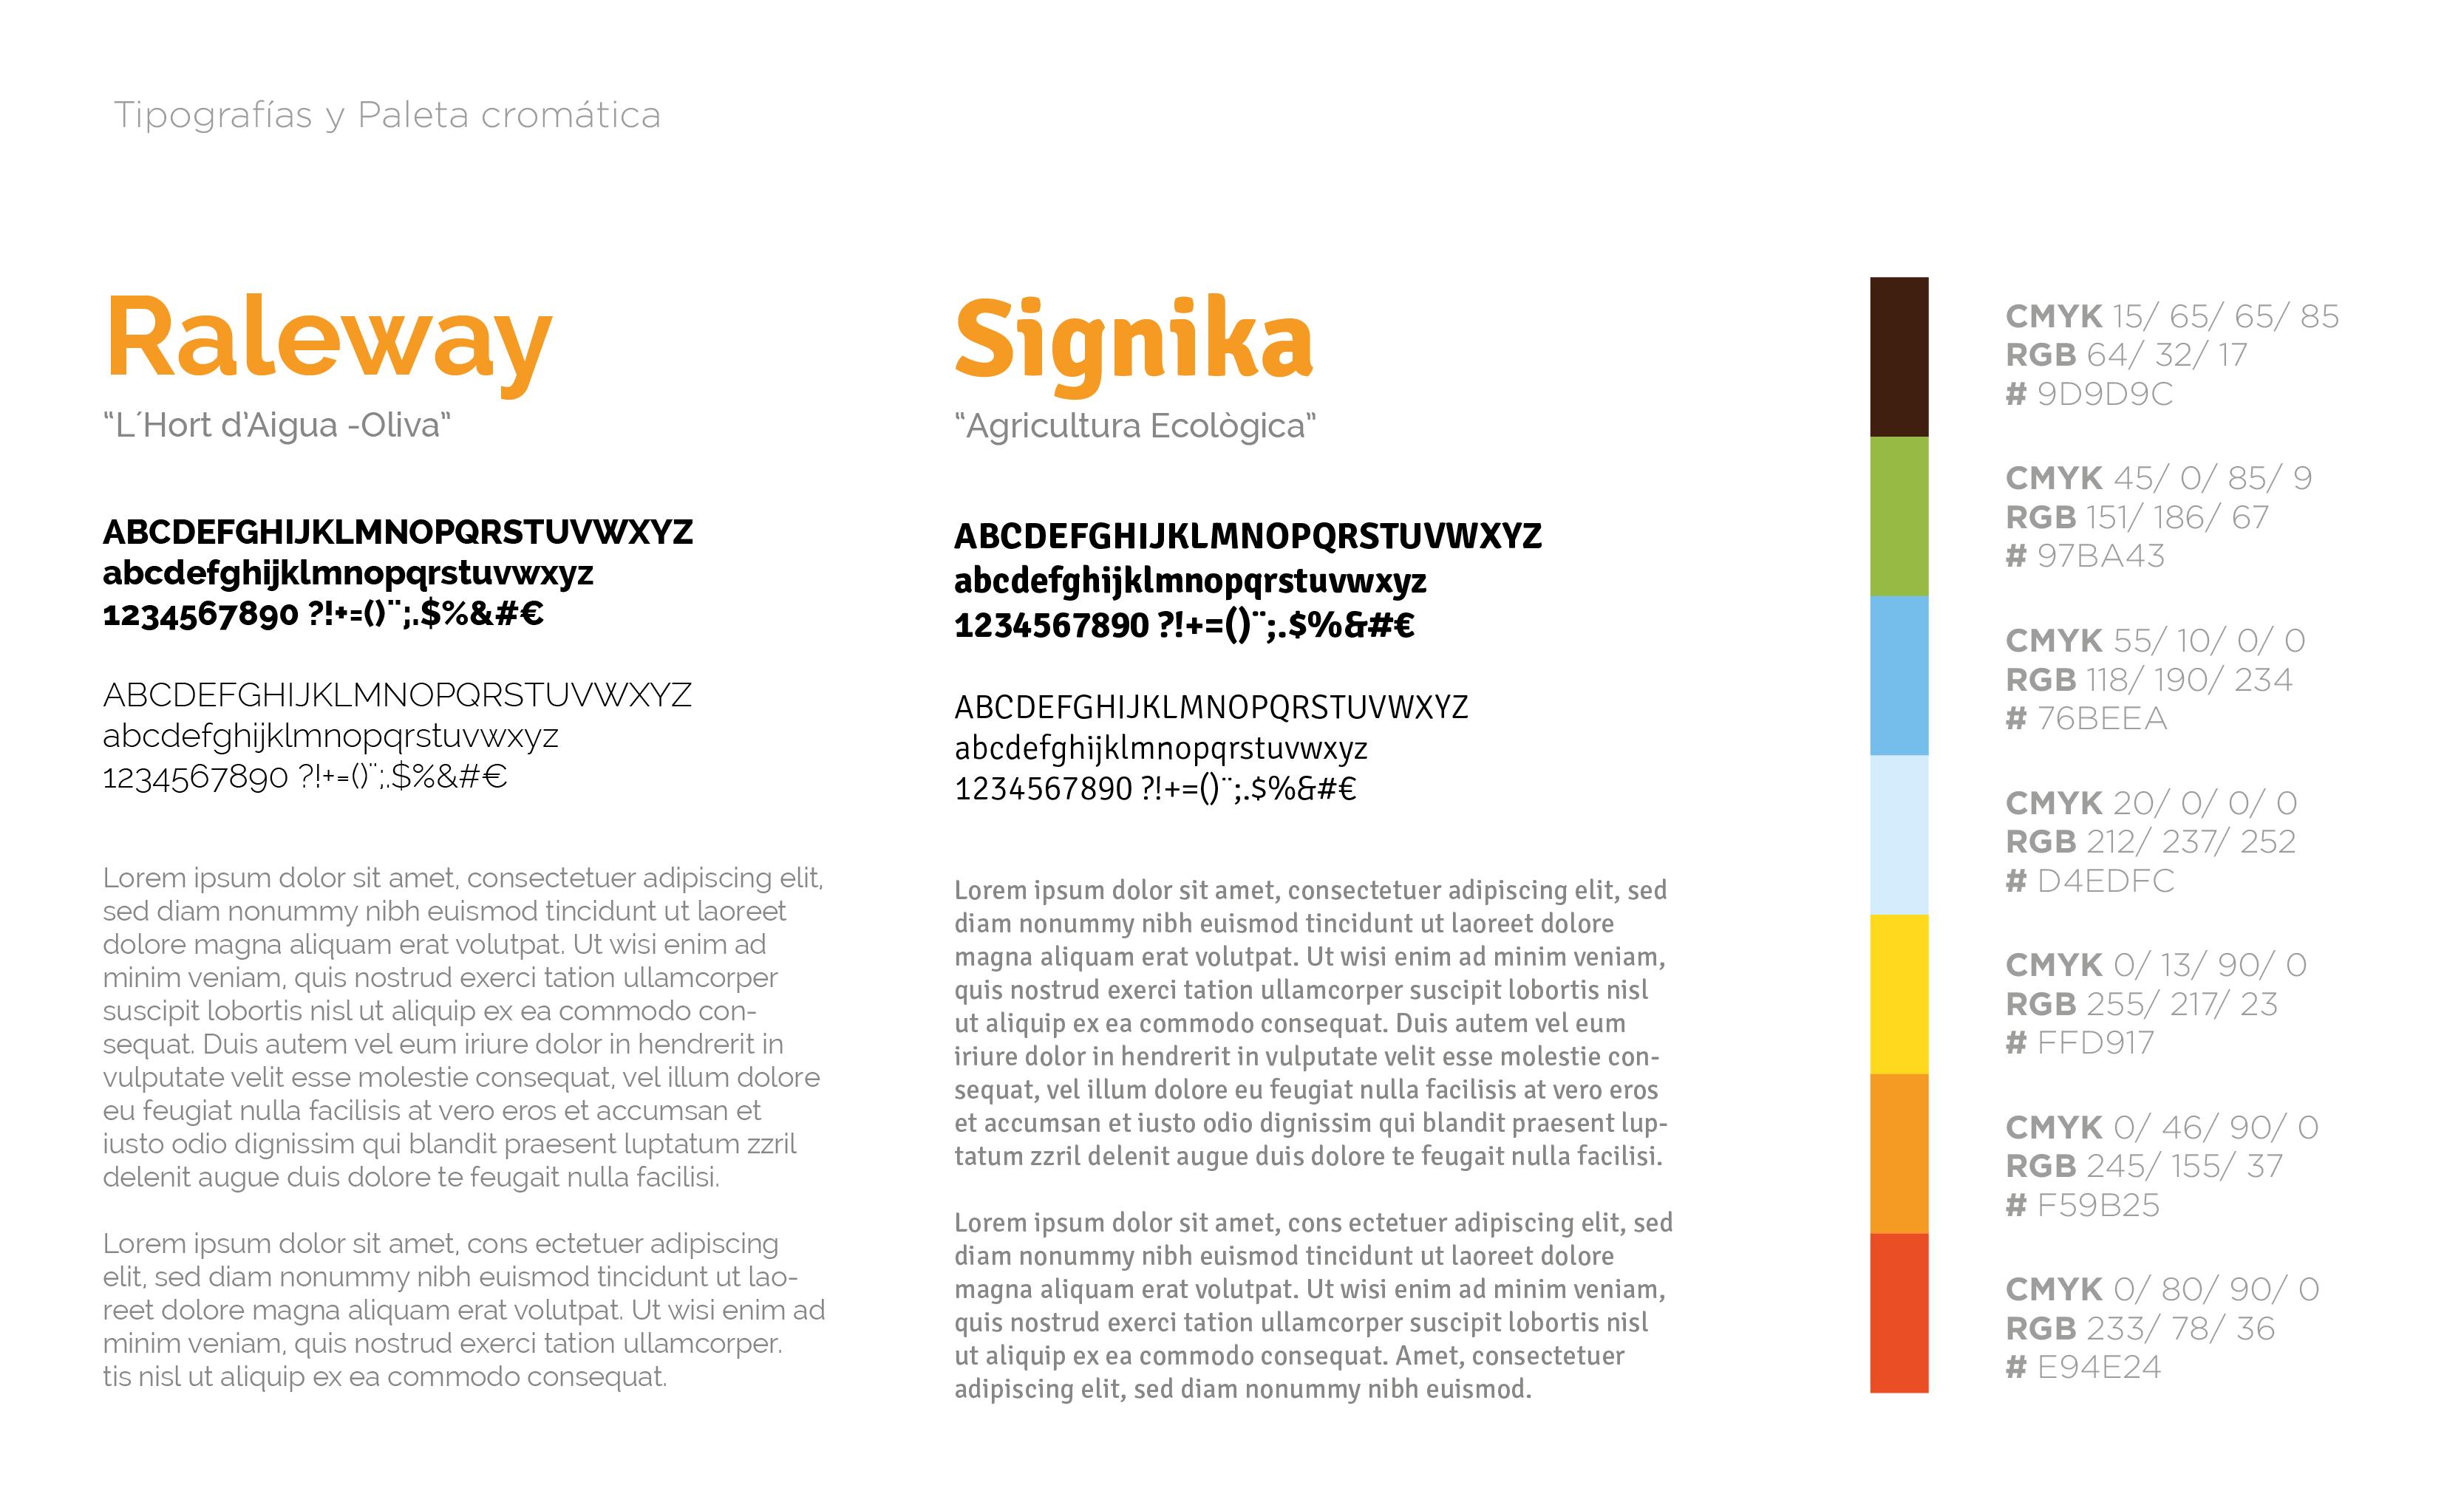 L´Hort d'Aigua-Oliva, Diseño de logotipo, tipografía corporativa, colores corporativos